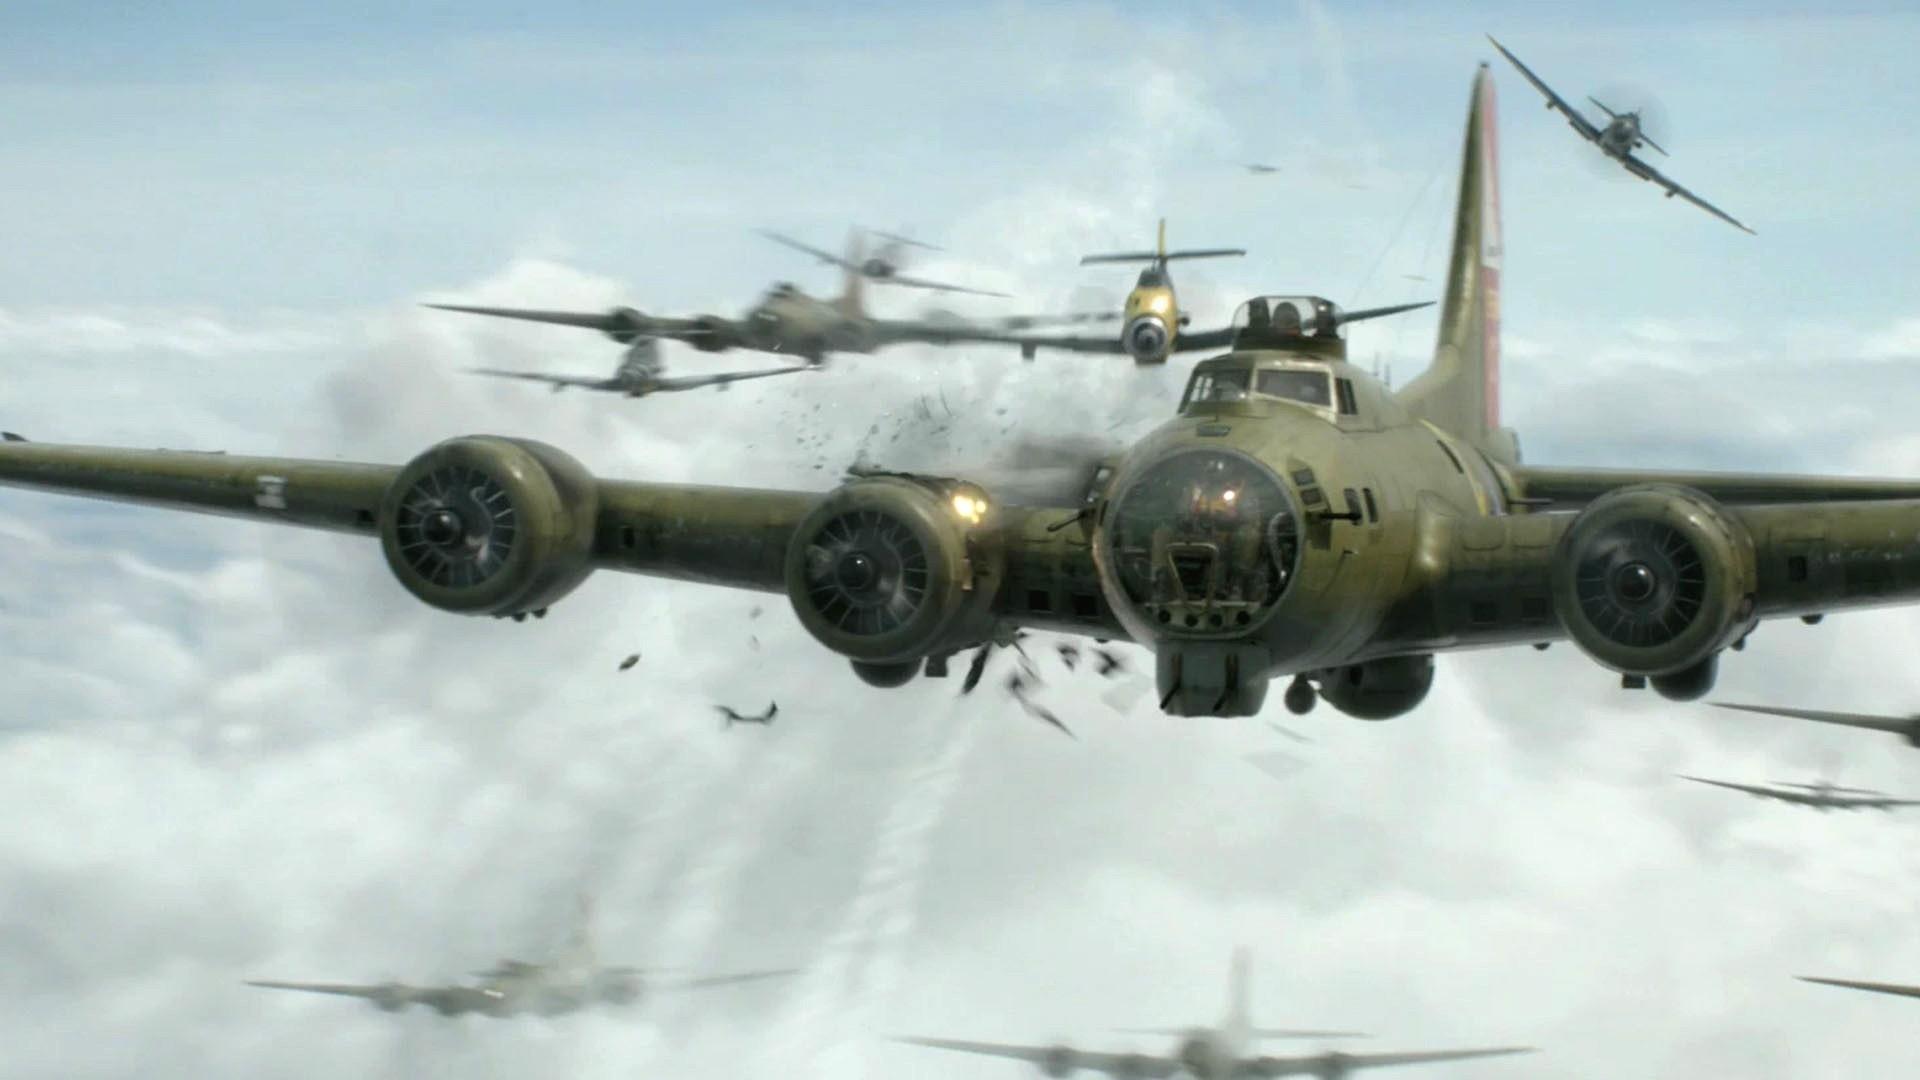 flying fortress mission 1920x1080 wallpaper Vehiclehi HD WallpaperHi 1920x1080